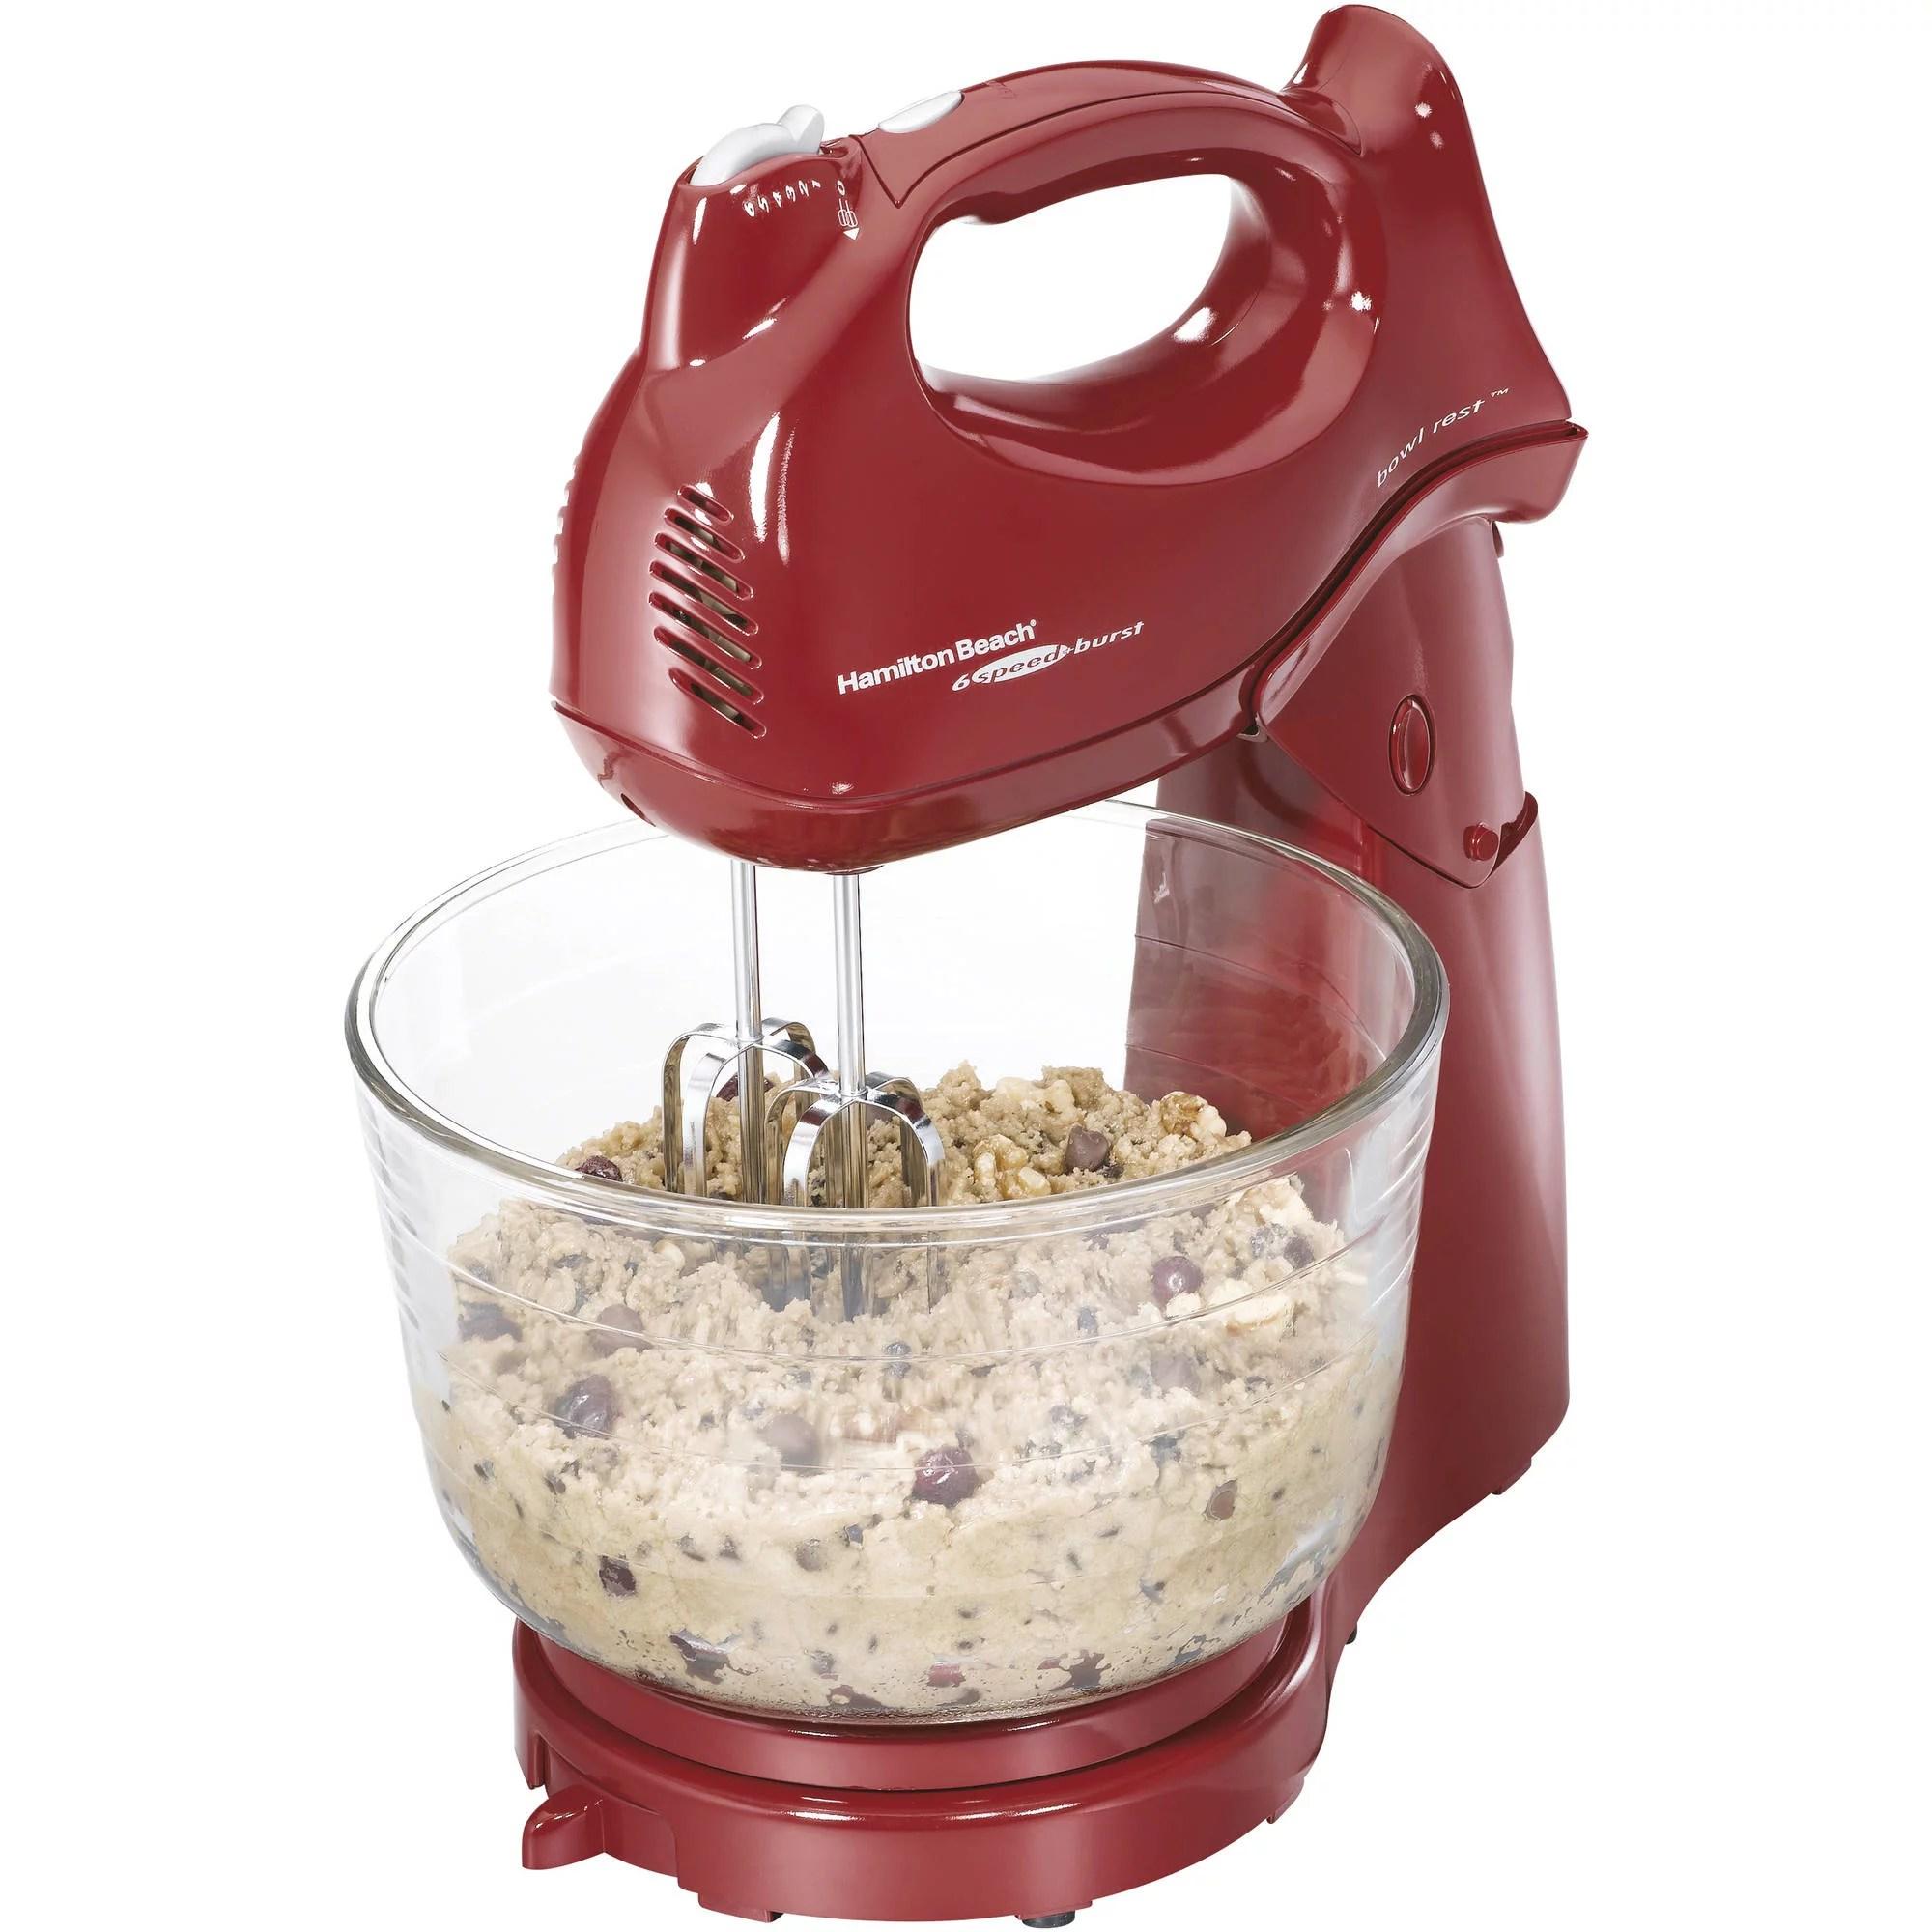 walmart kitchen aid mixer cabinet organizing ideas hamilton beach power deluxe 4 quart stand red 64699 com